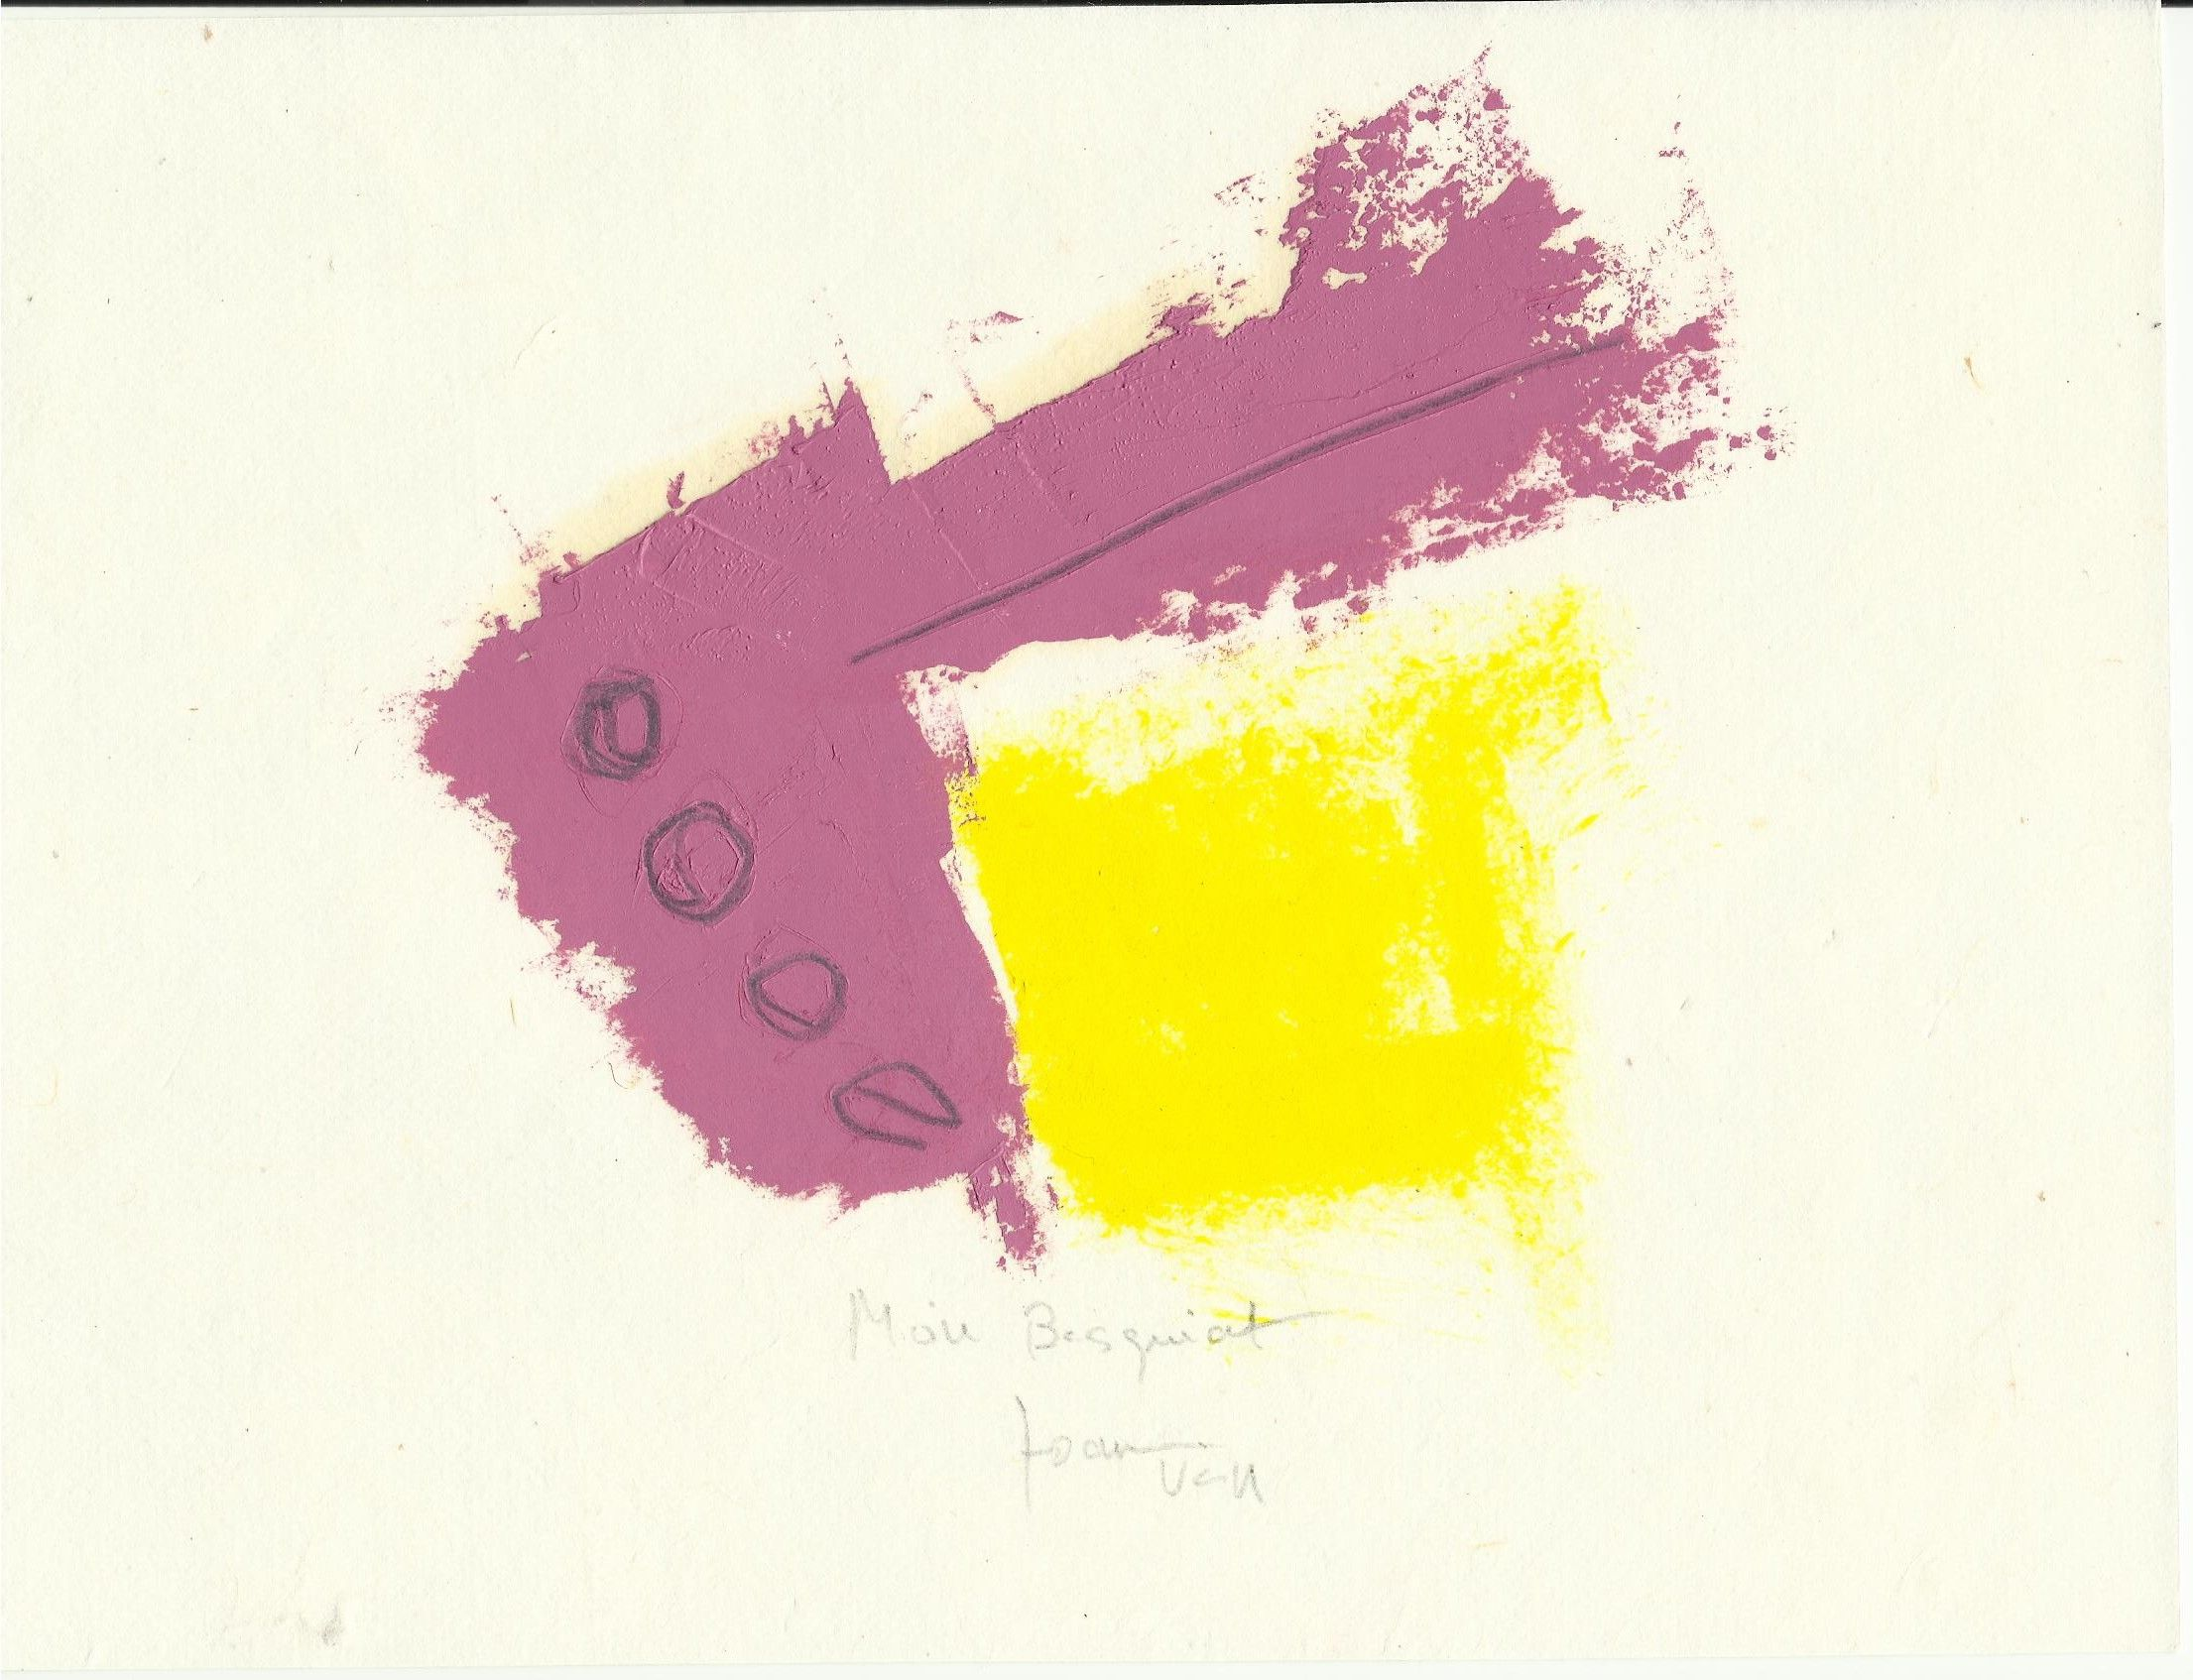 Serie inspirada en el pintor J.M. Basquiat